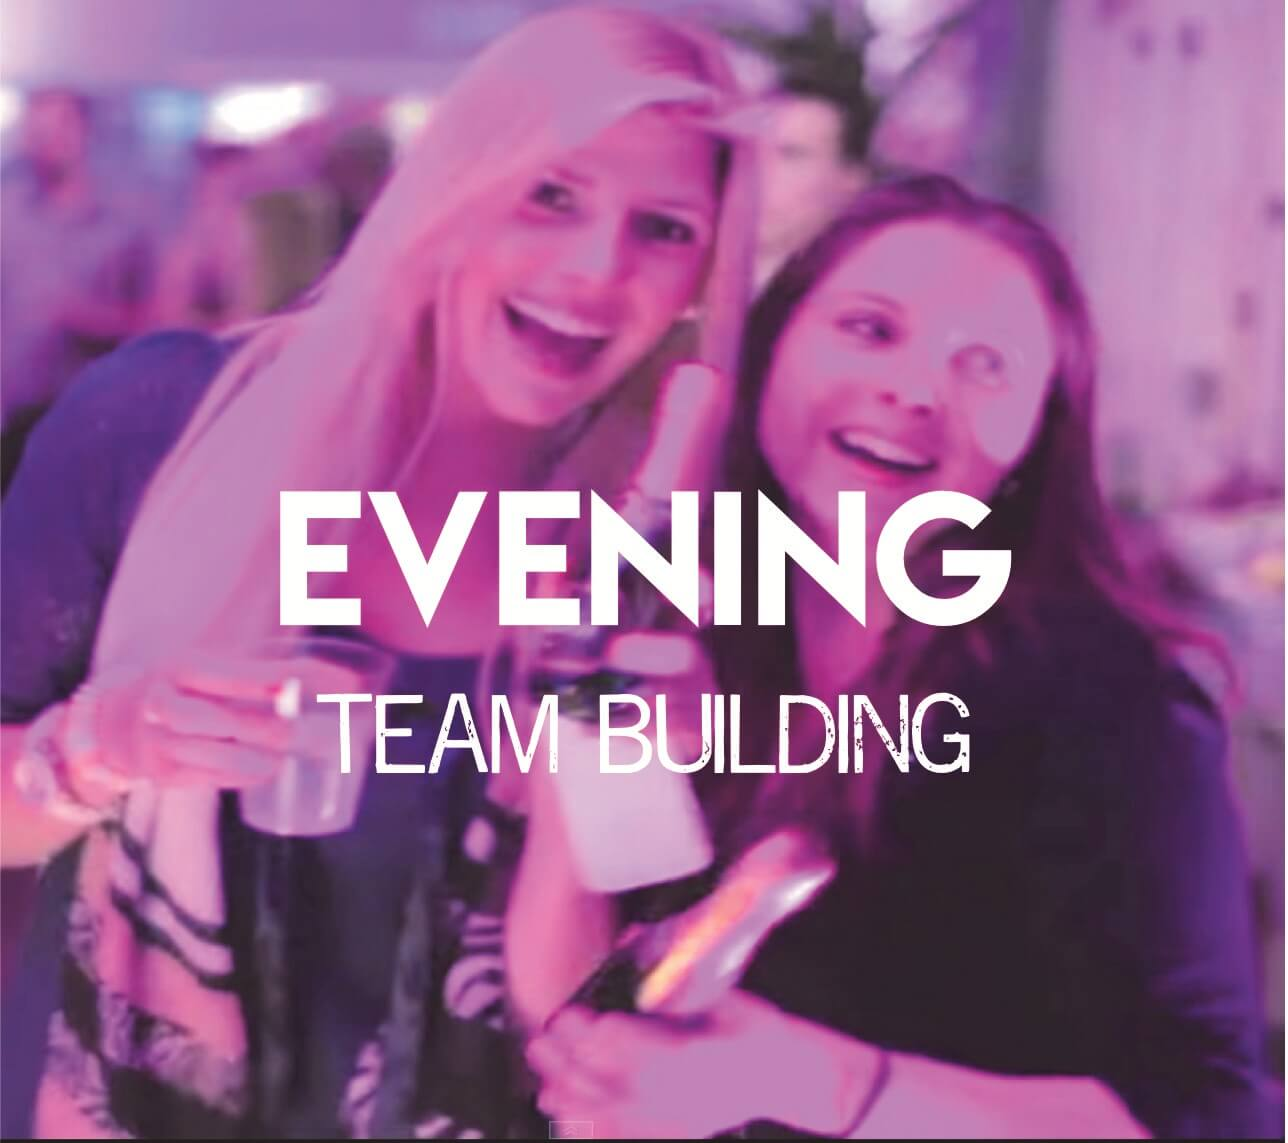 Evening Team Building